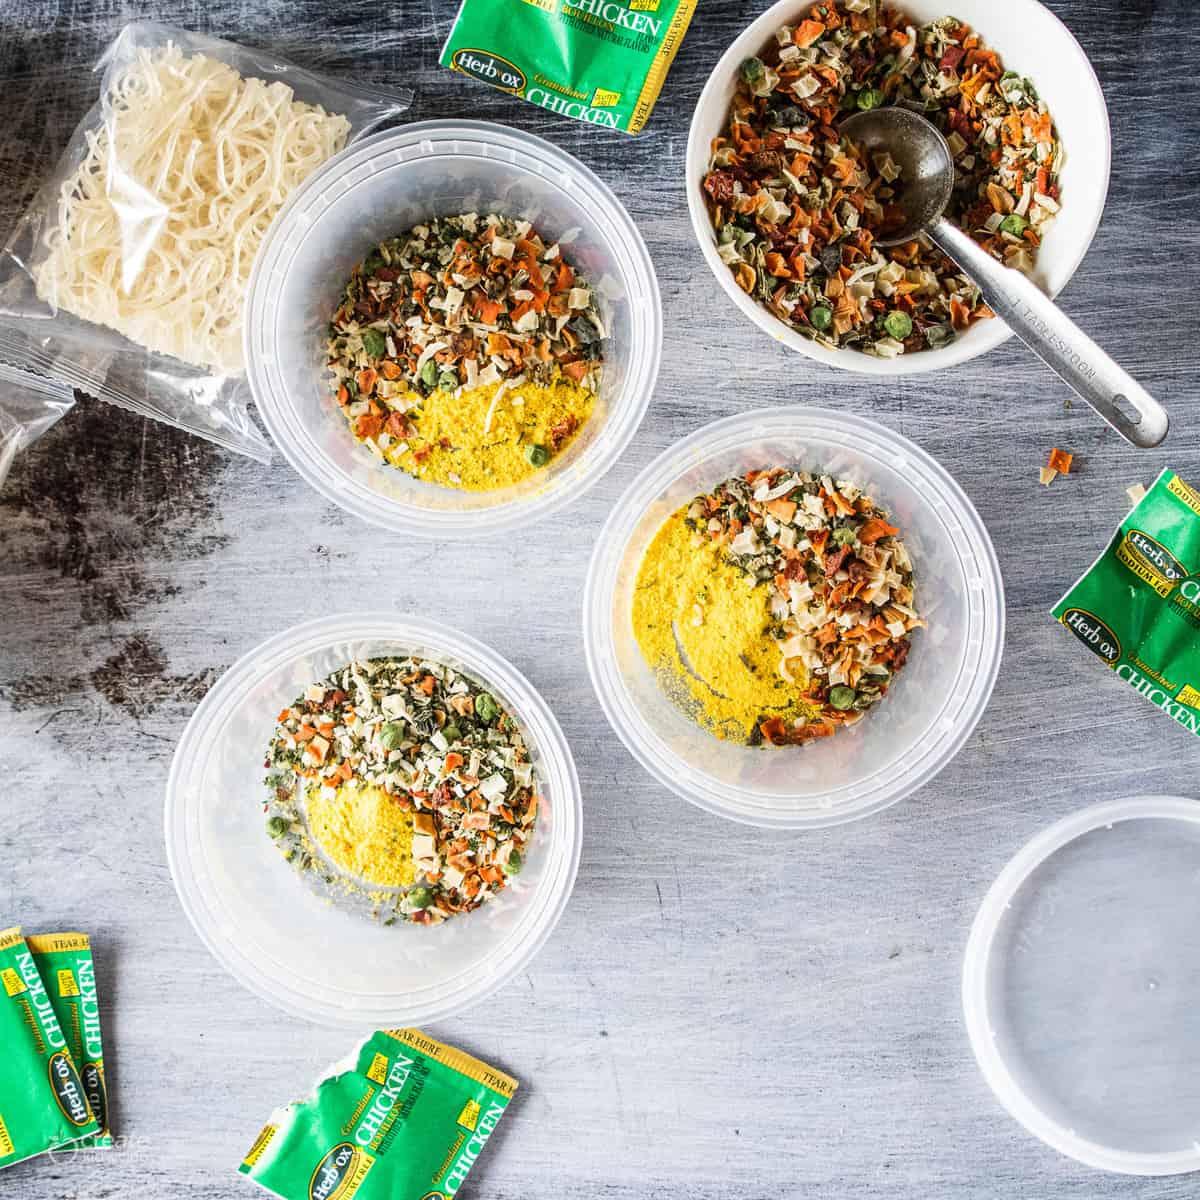 ingredients for low sodium ramen noodles